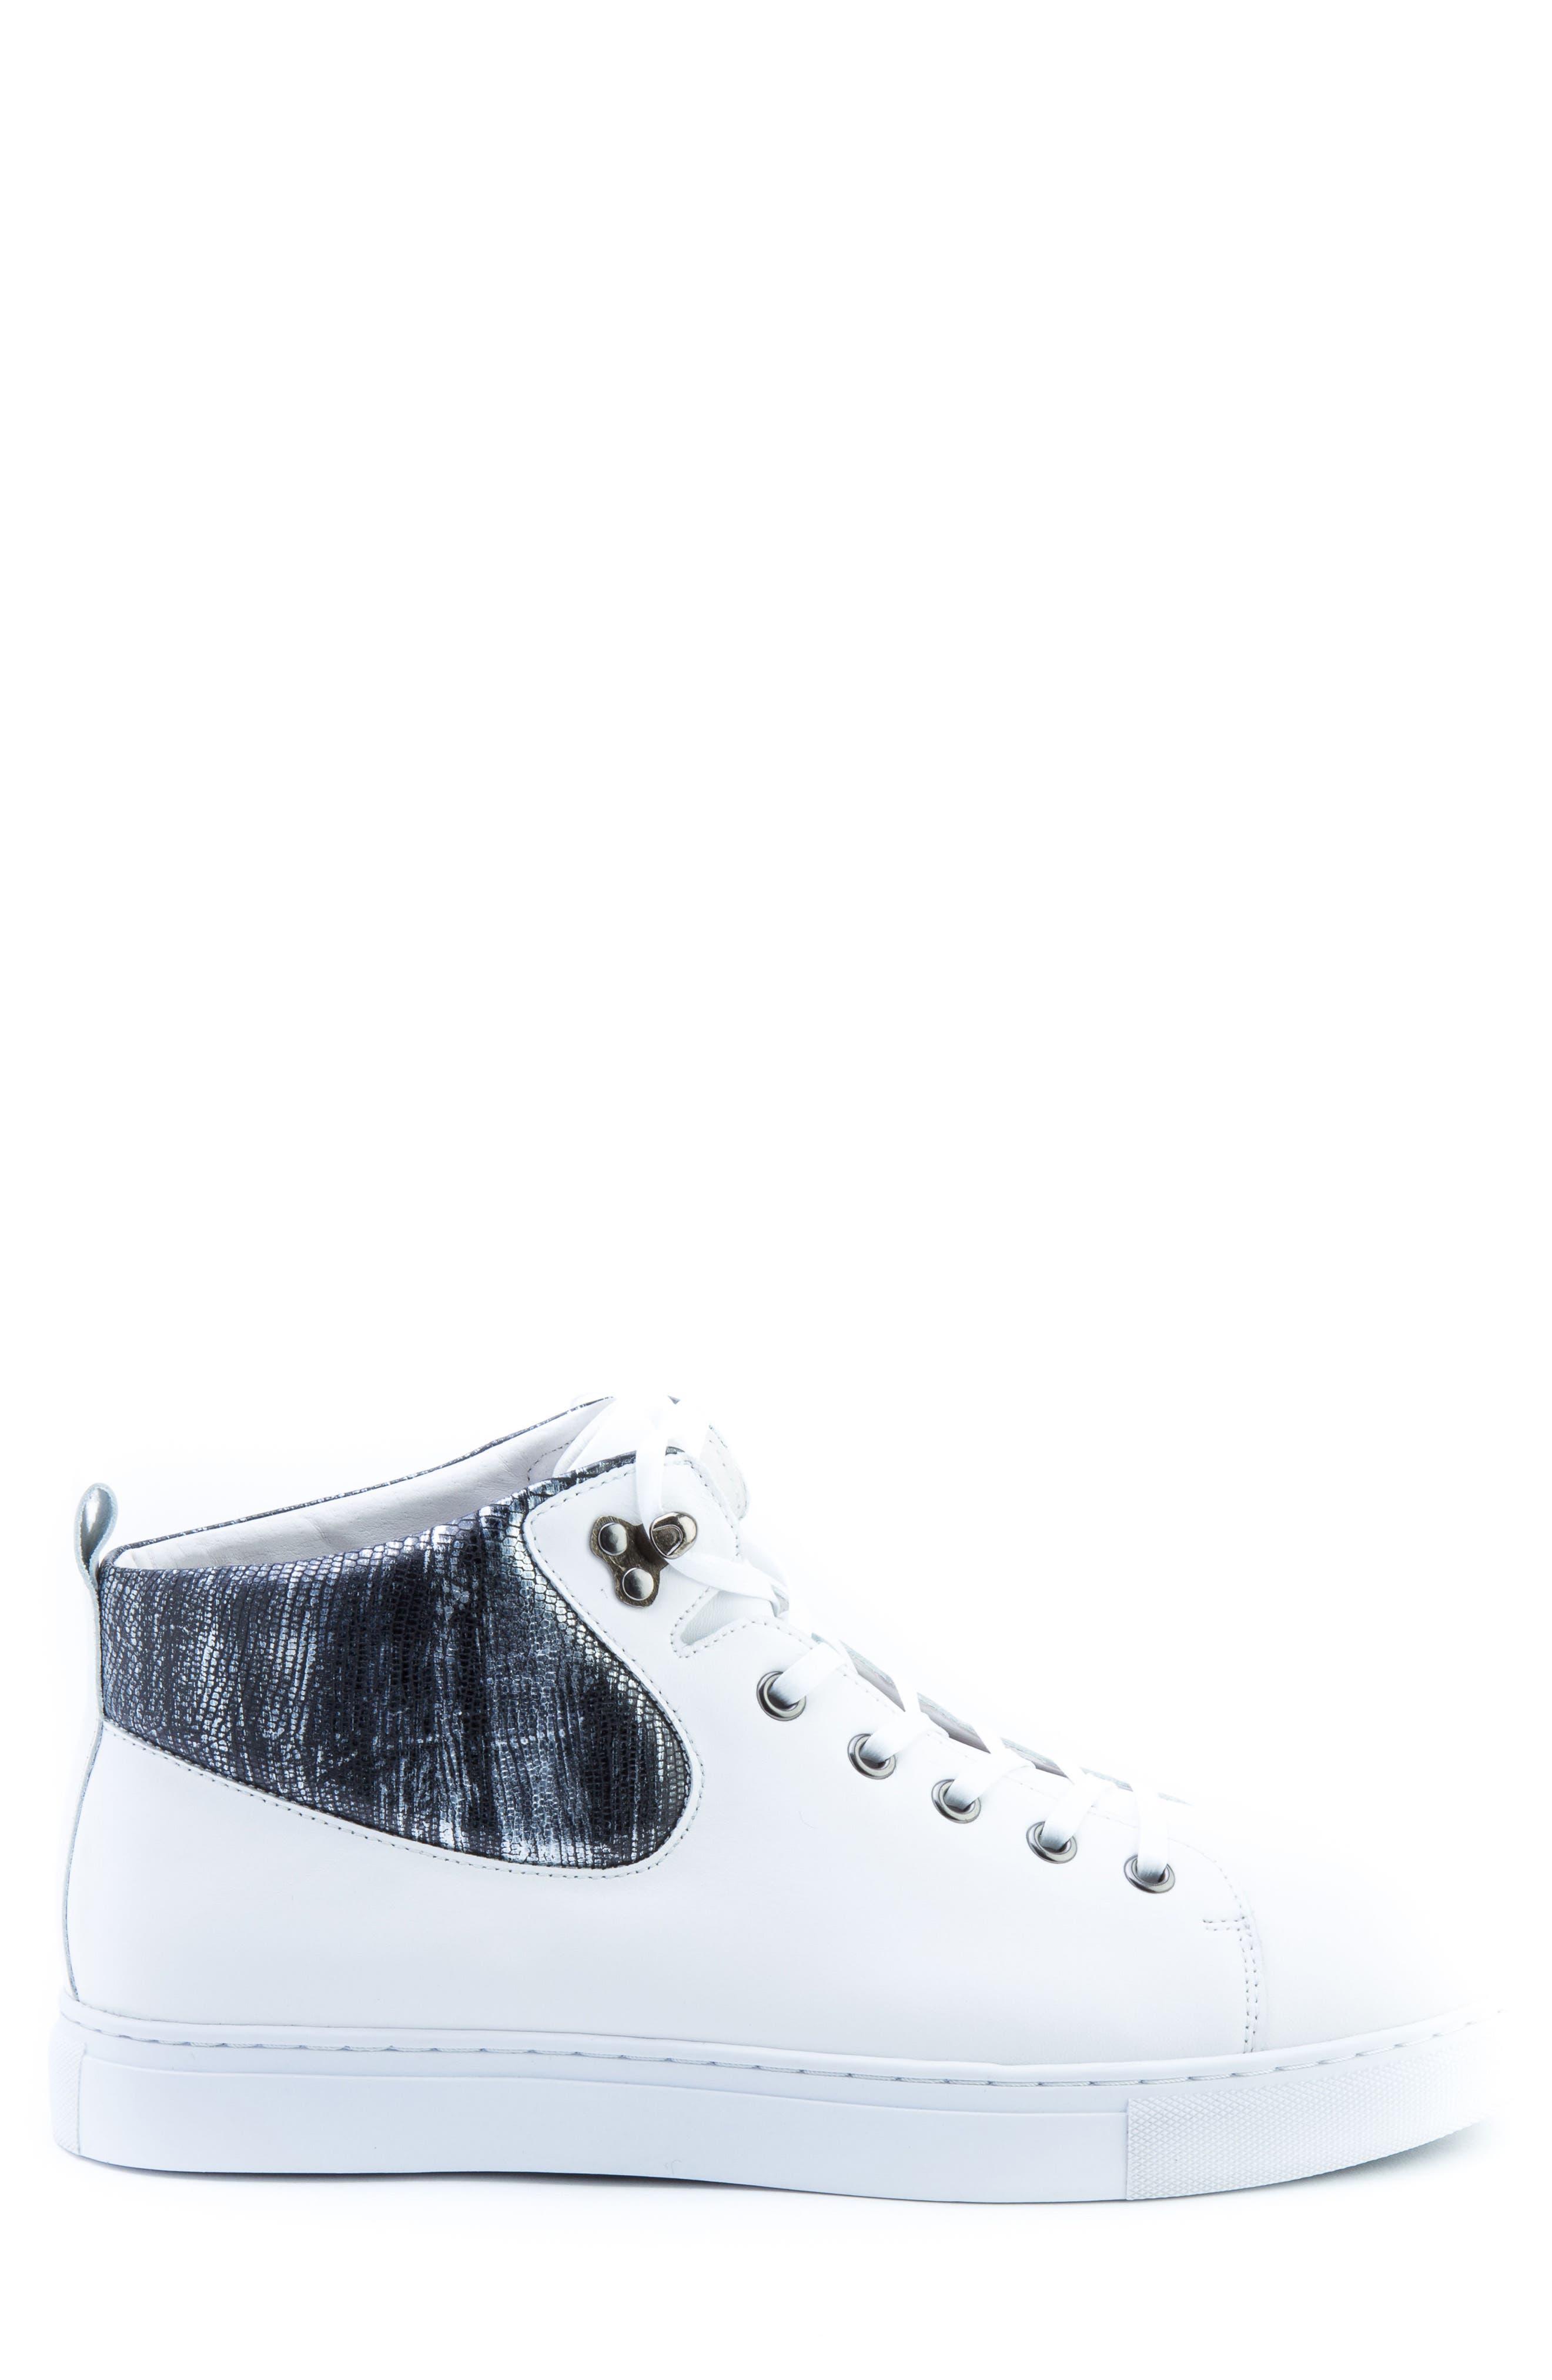 Carroll Sneaker,                             Alternate thumbnail 3, color,                             White Leather